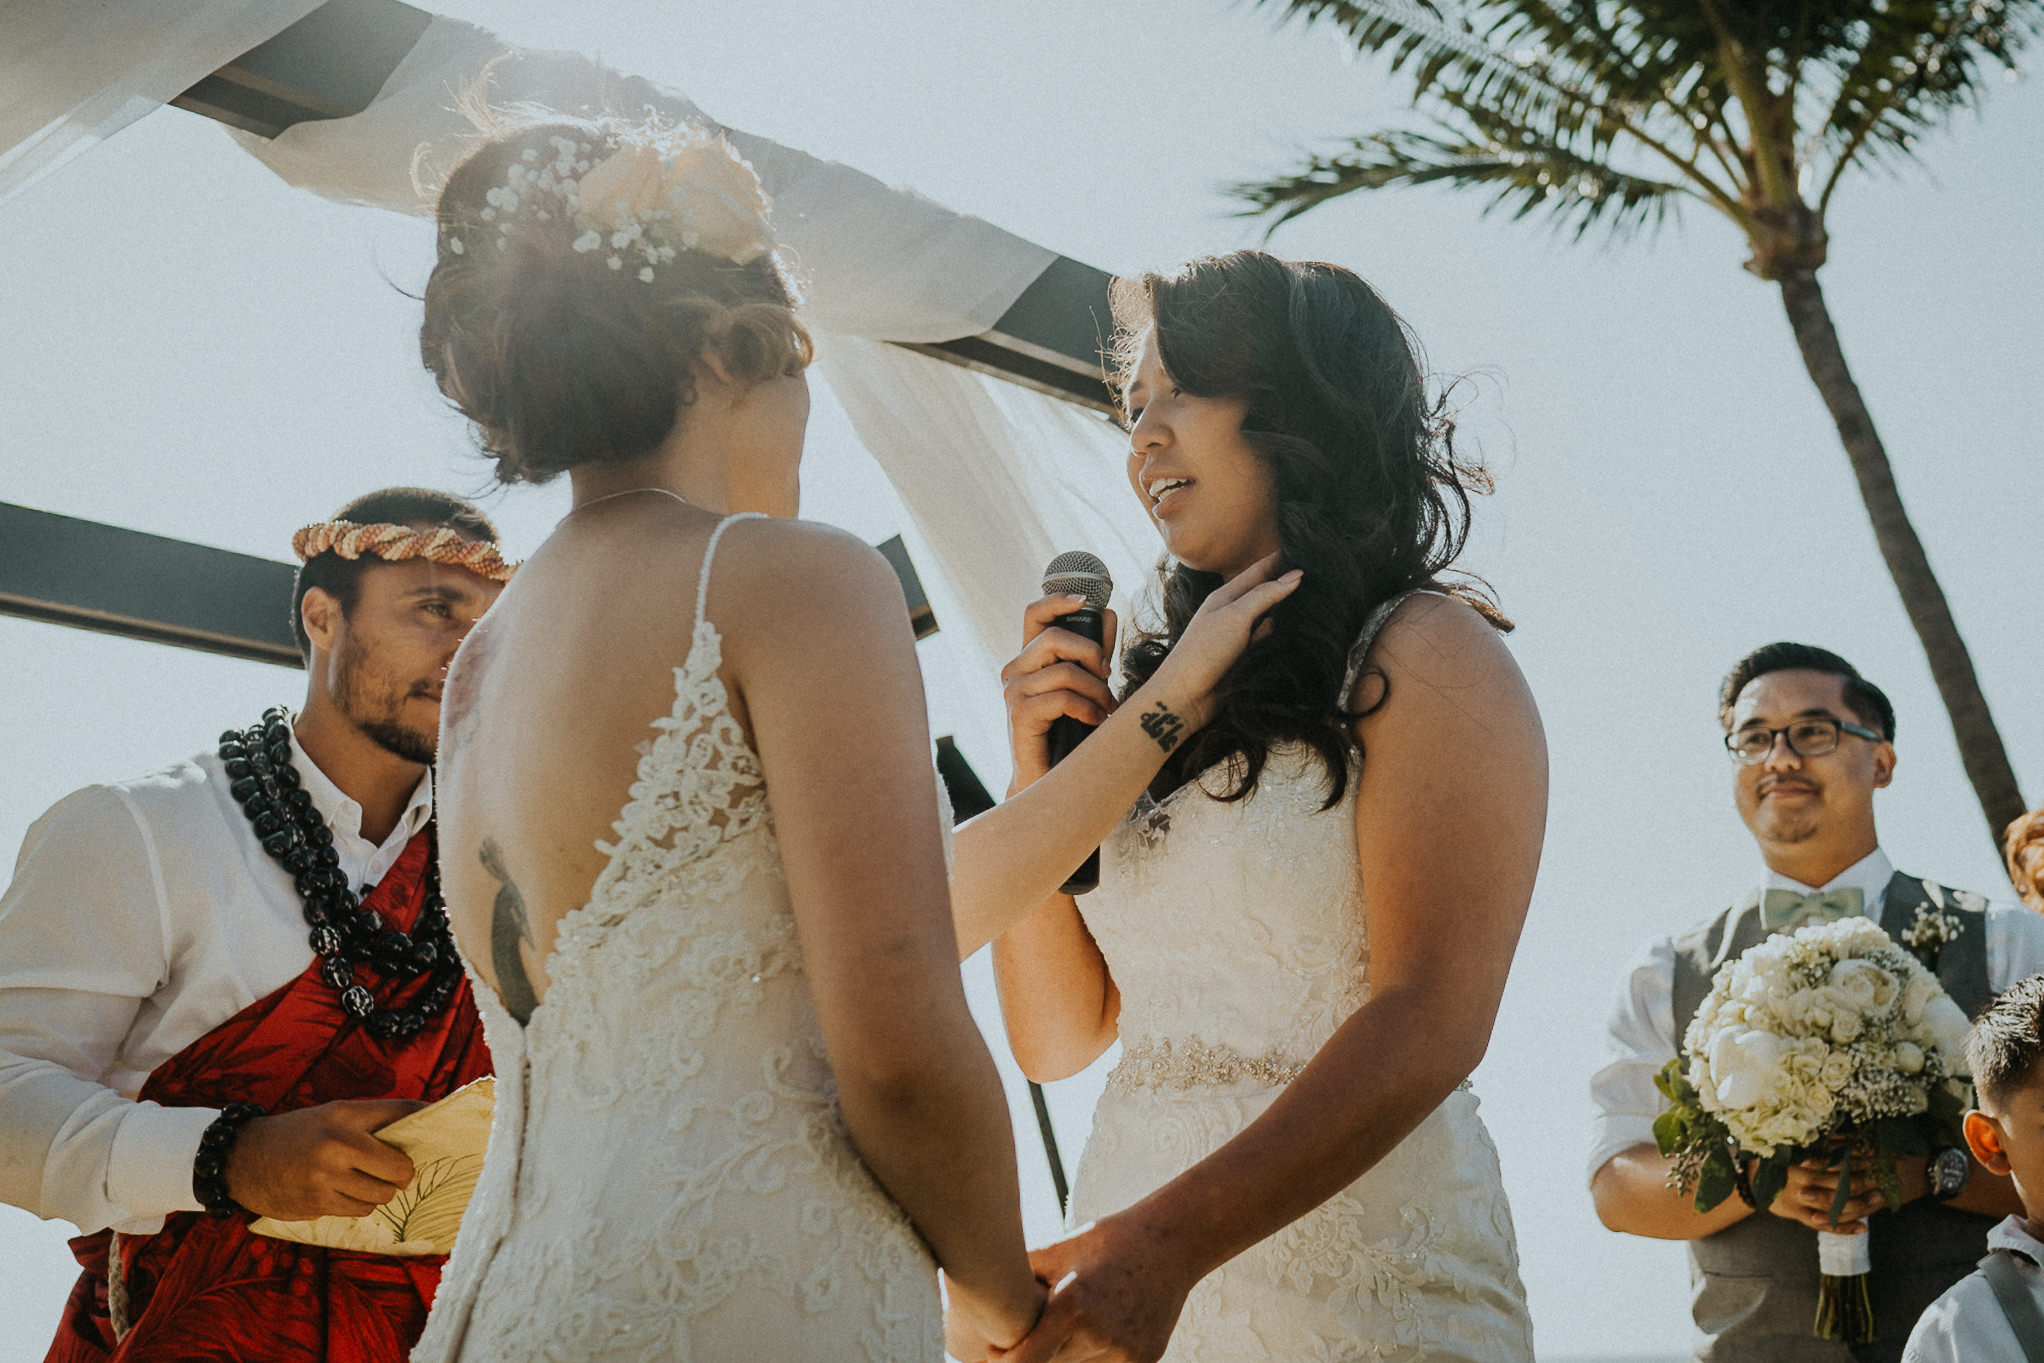 Maui_Destination_wedding_Alfred_Tang-9.jpg